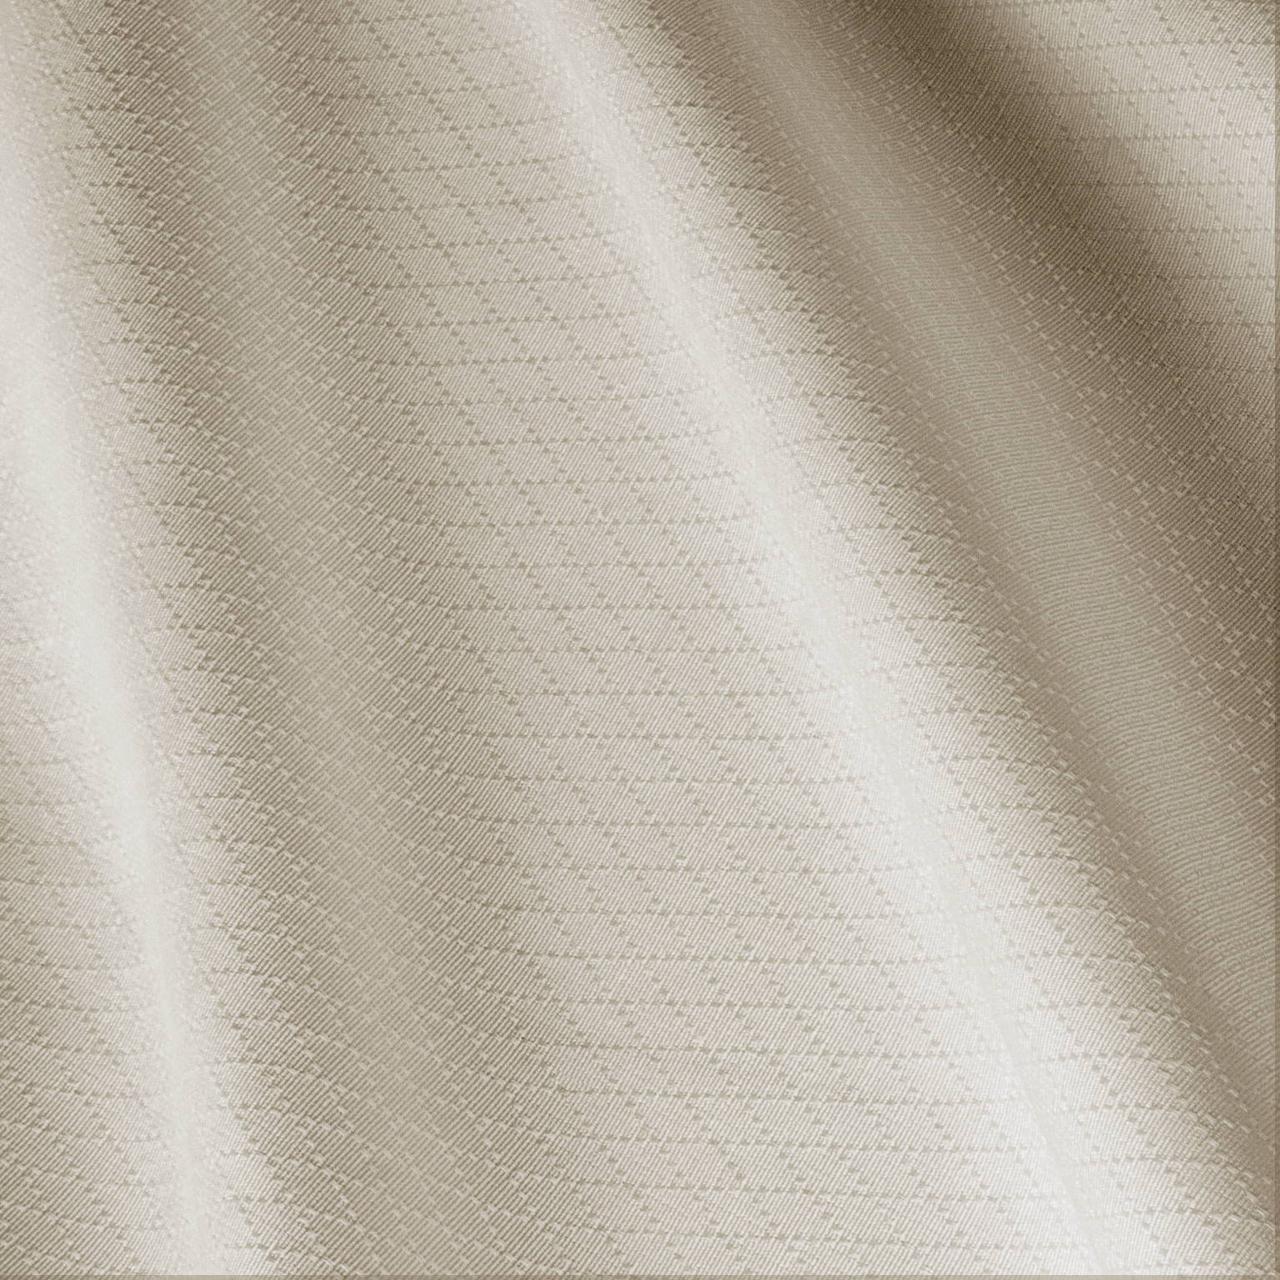 Ткань для скатертей и салфеток (ресторан) 400289 v4